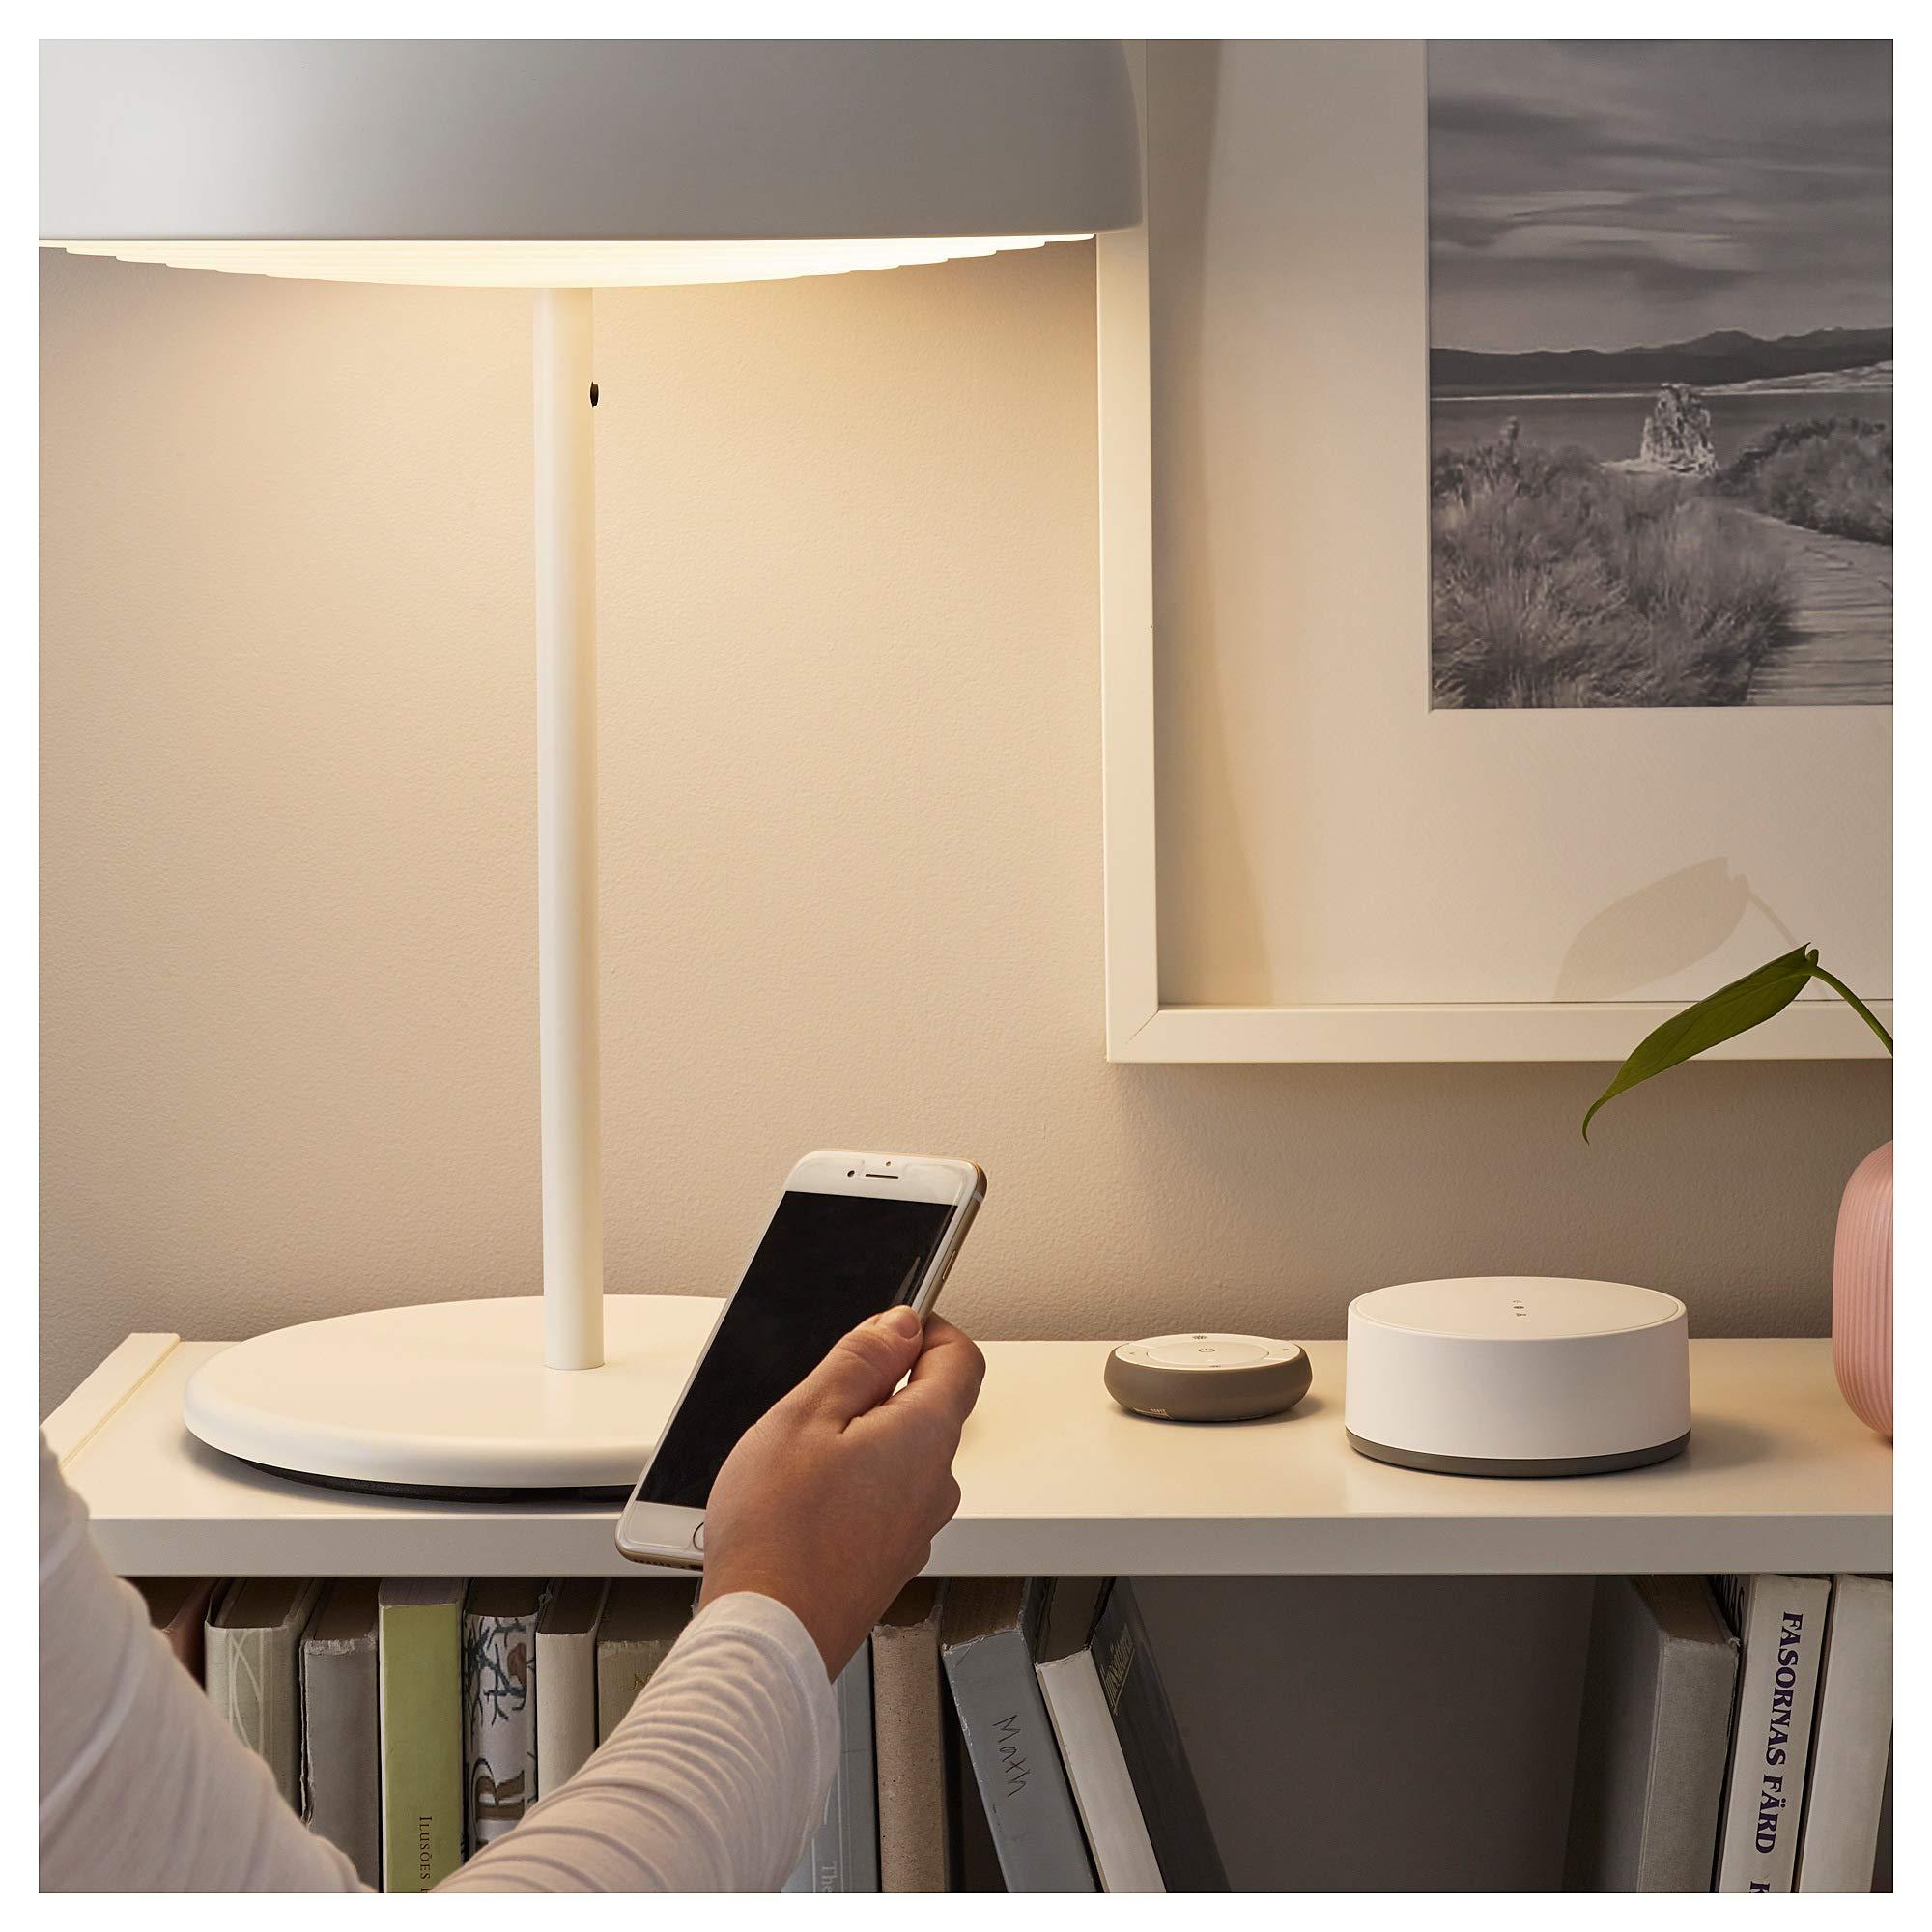 IKEA 003.378.13 Trådfri Gateway, White by IKEA.. (Image #2)